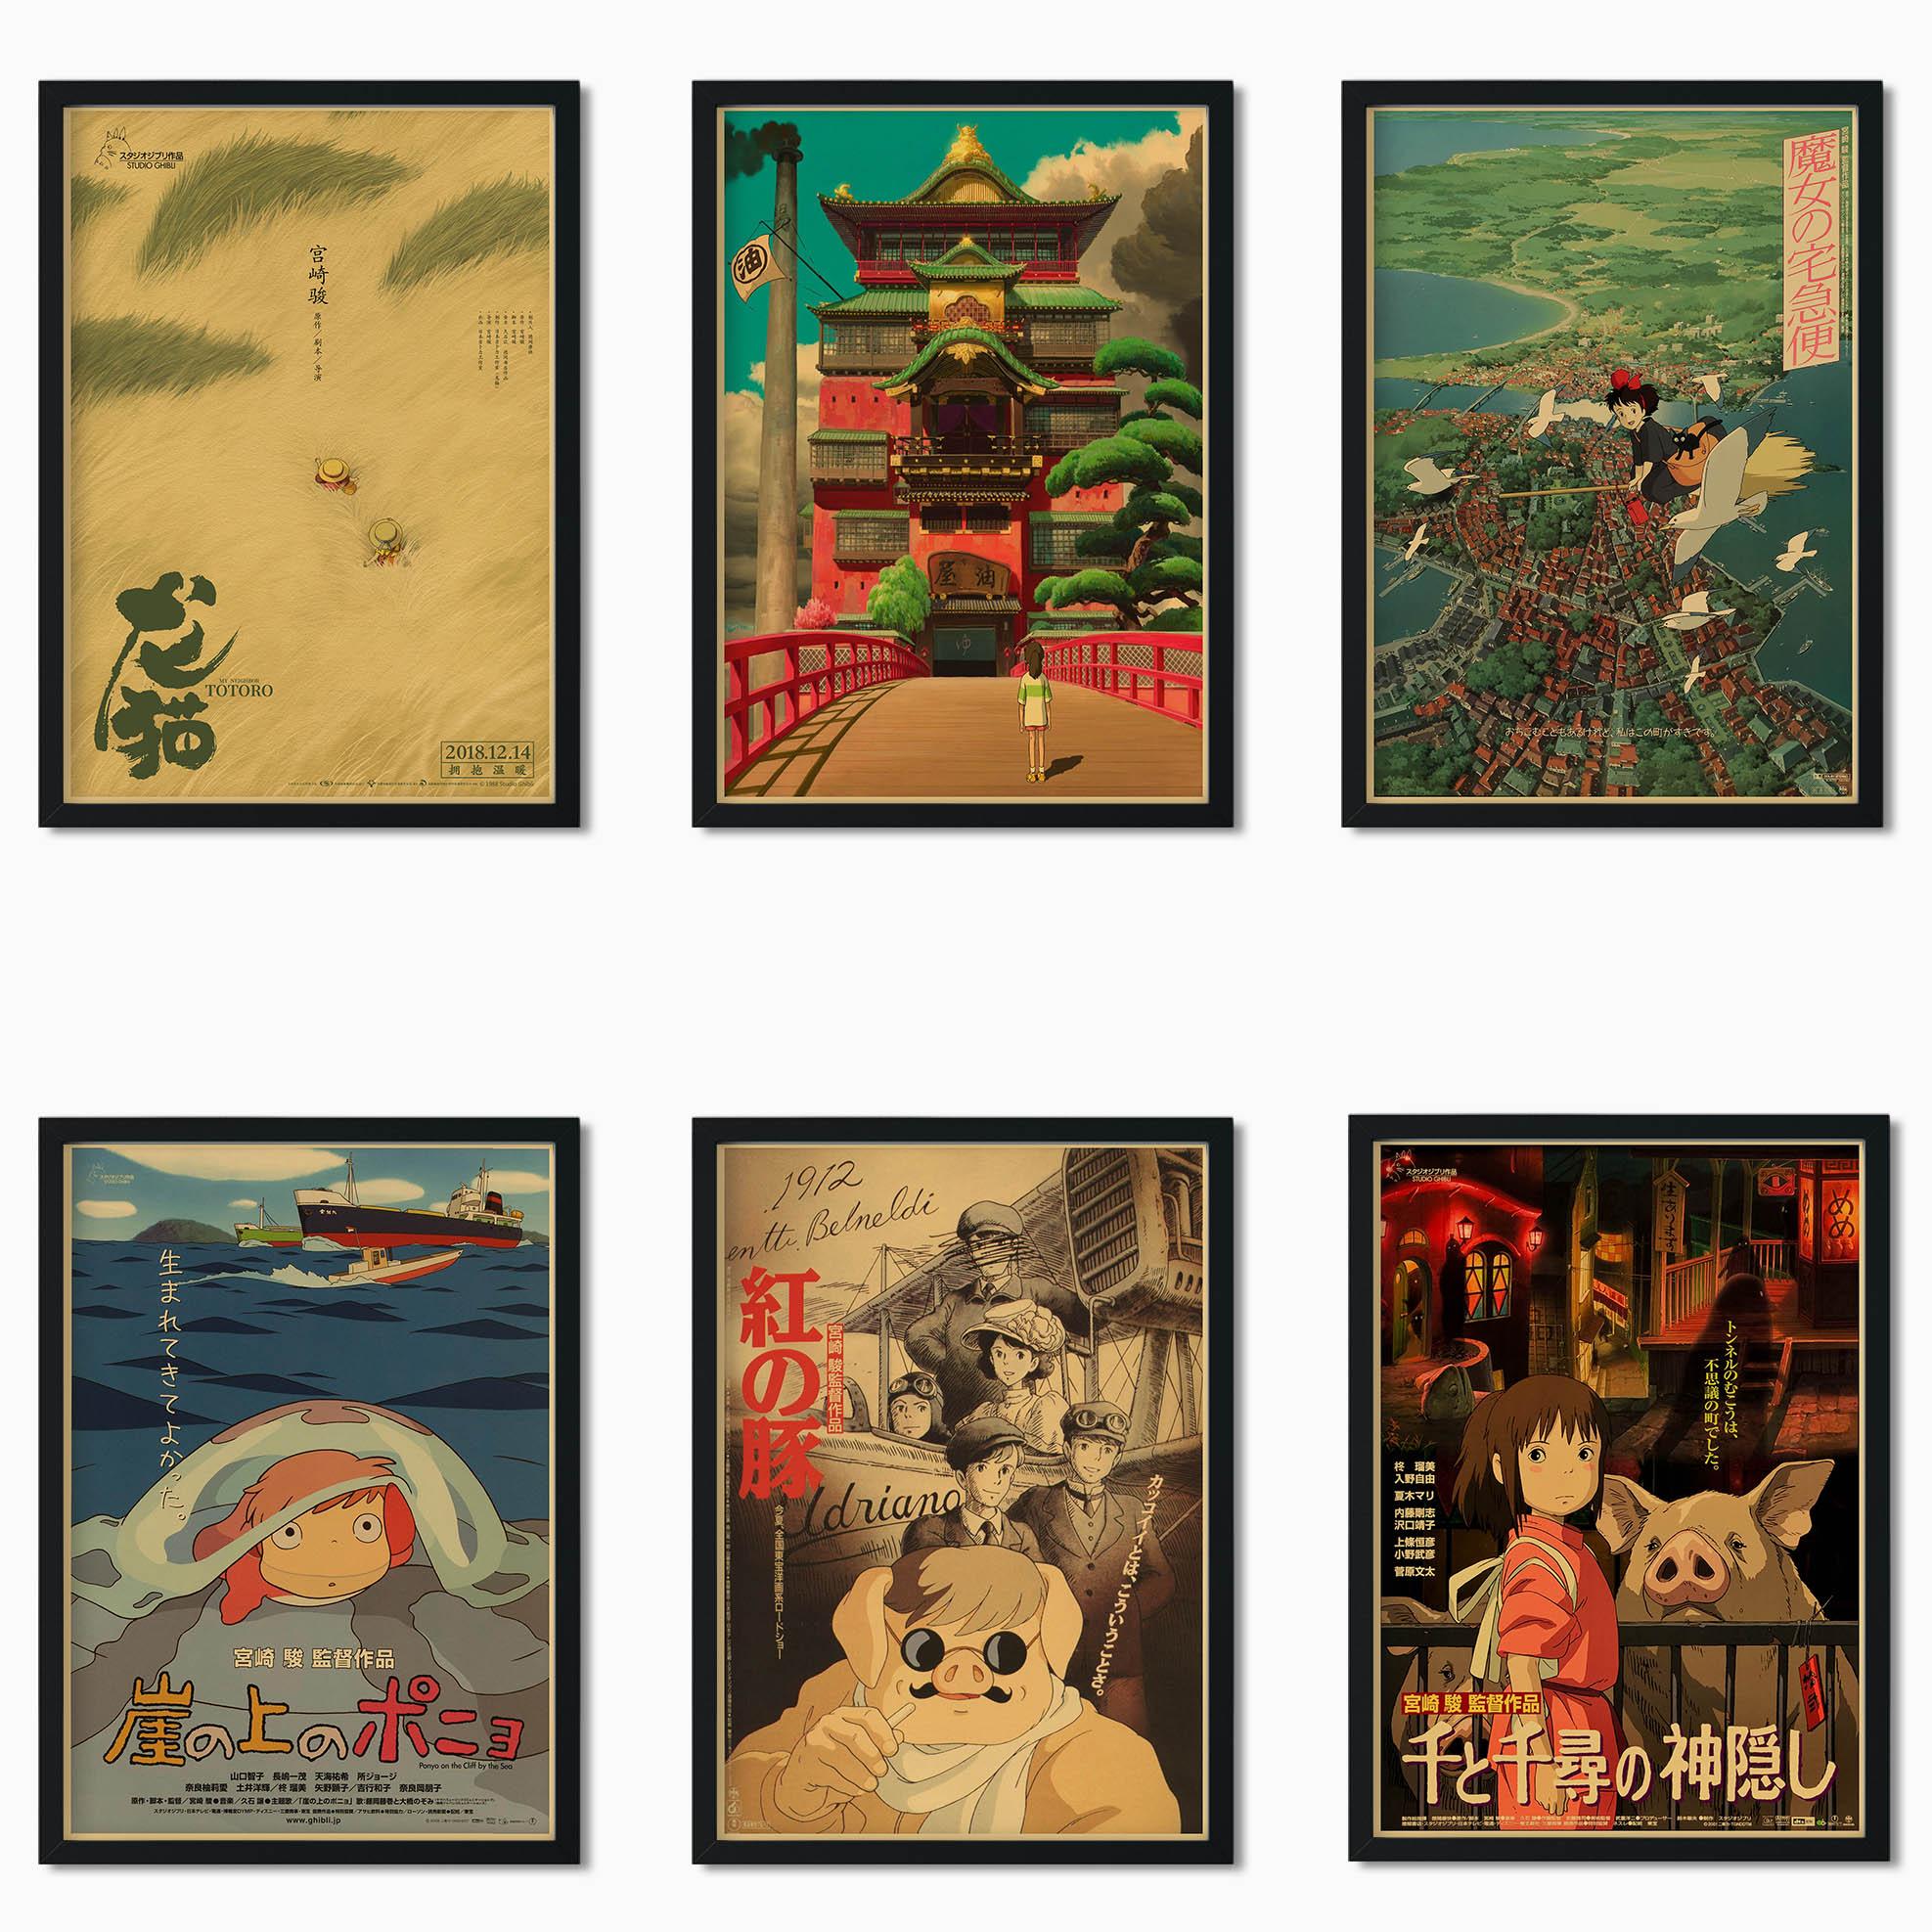 Tableau de manga japonais Hayao Miyazaki, maître de peinture, avec spirit Away/Princess Mononoke/mon voisin Totoro, affiche de style rétro, o34